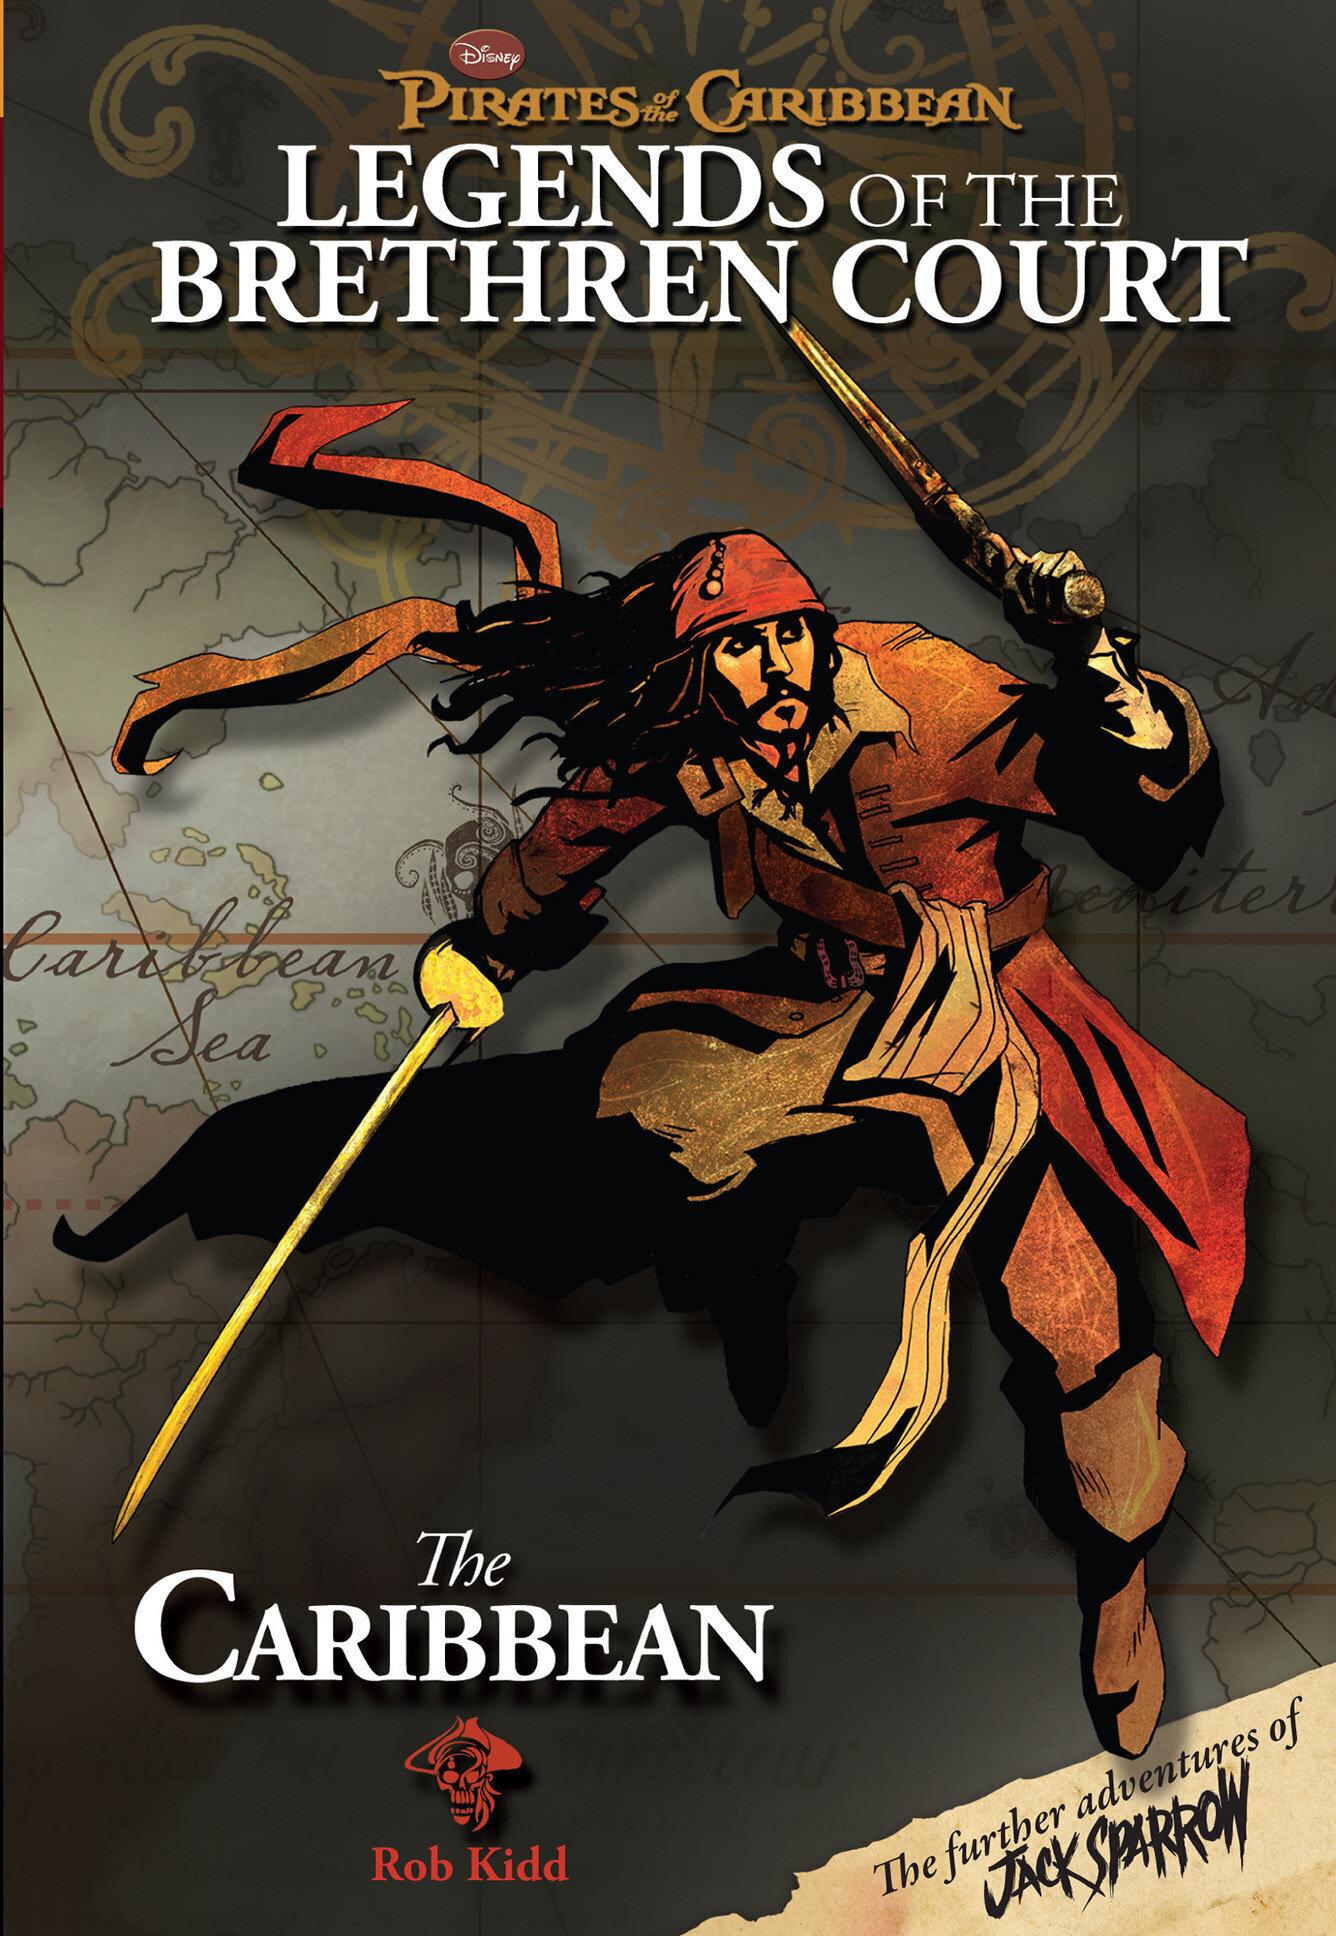 book acta conventus neo latini cantabrigensis proceedings of the